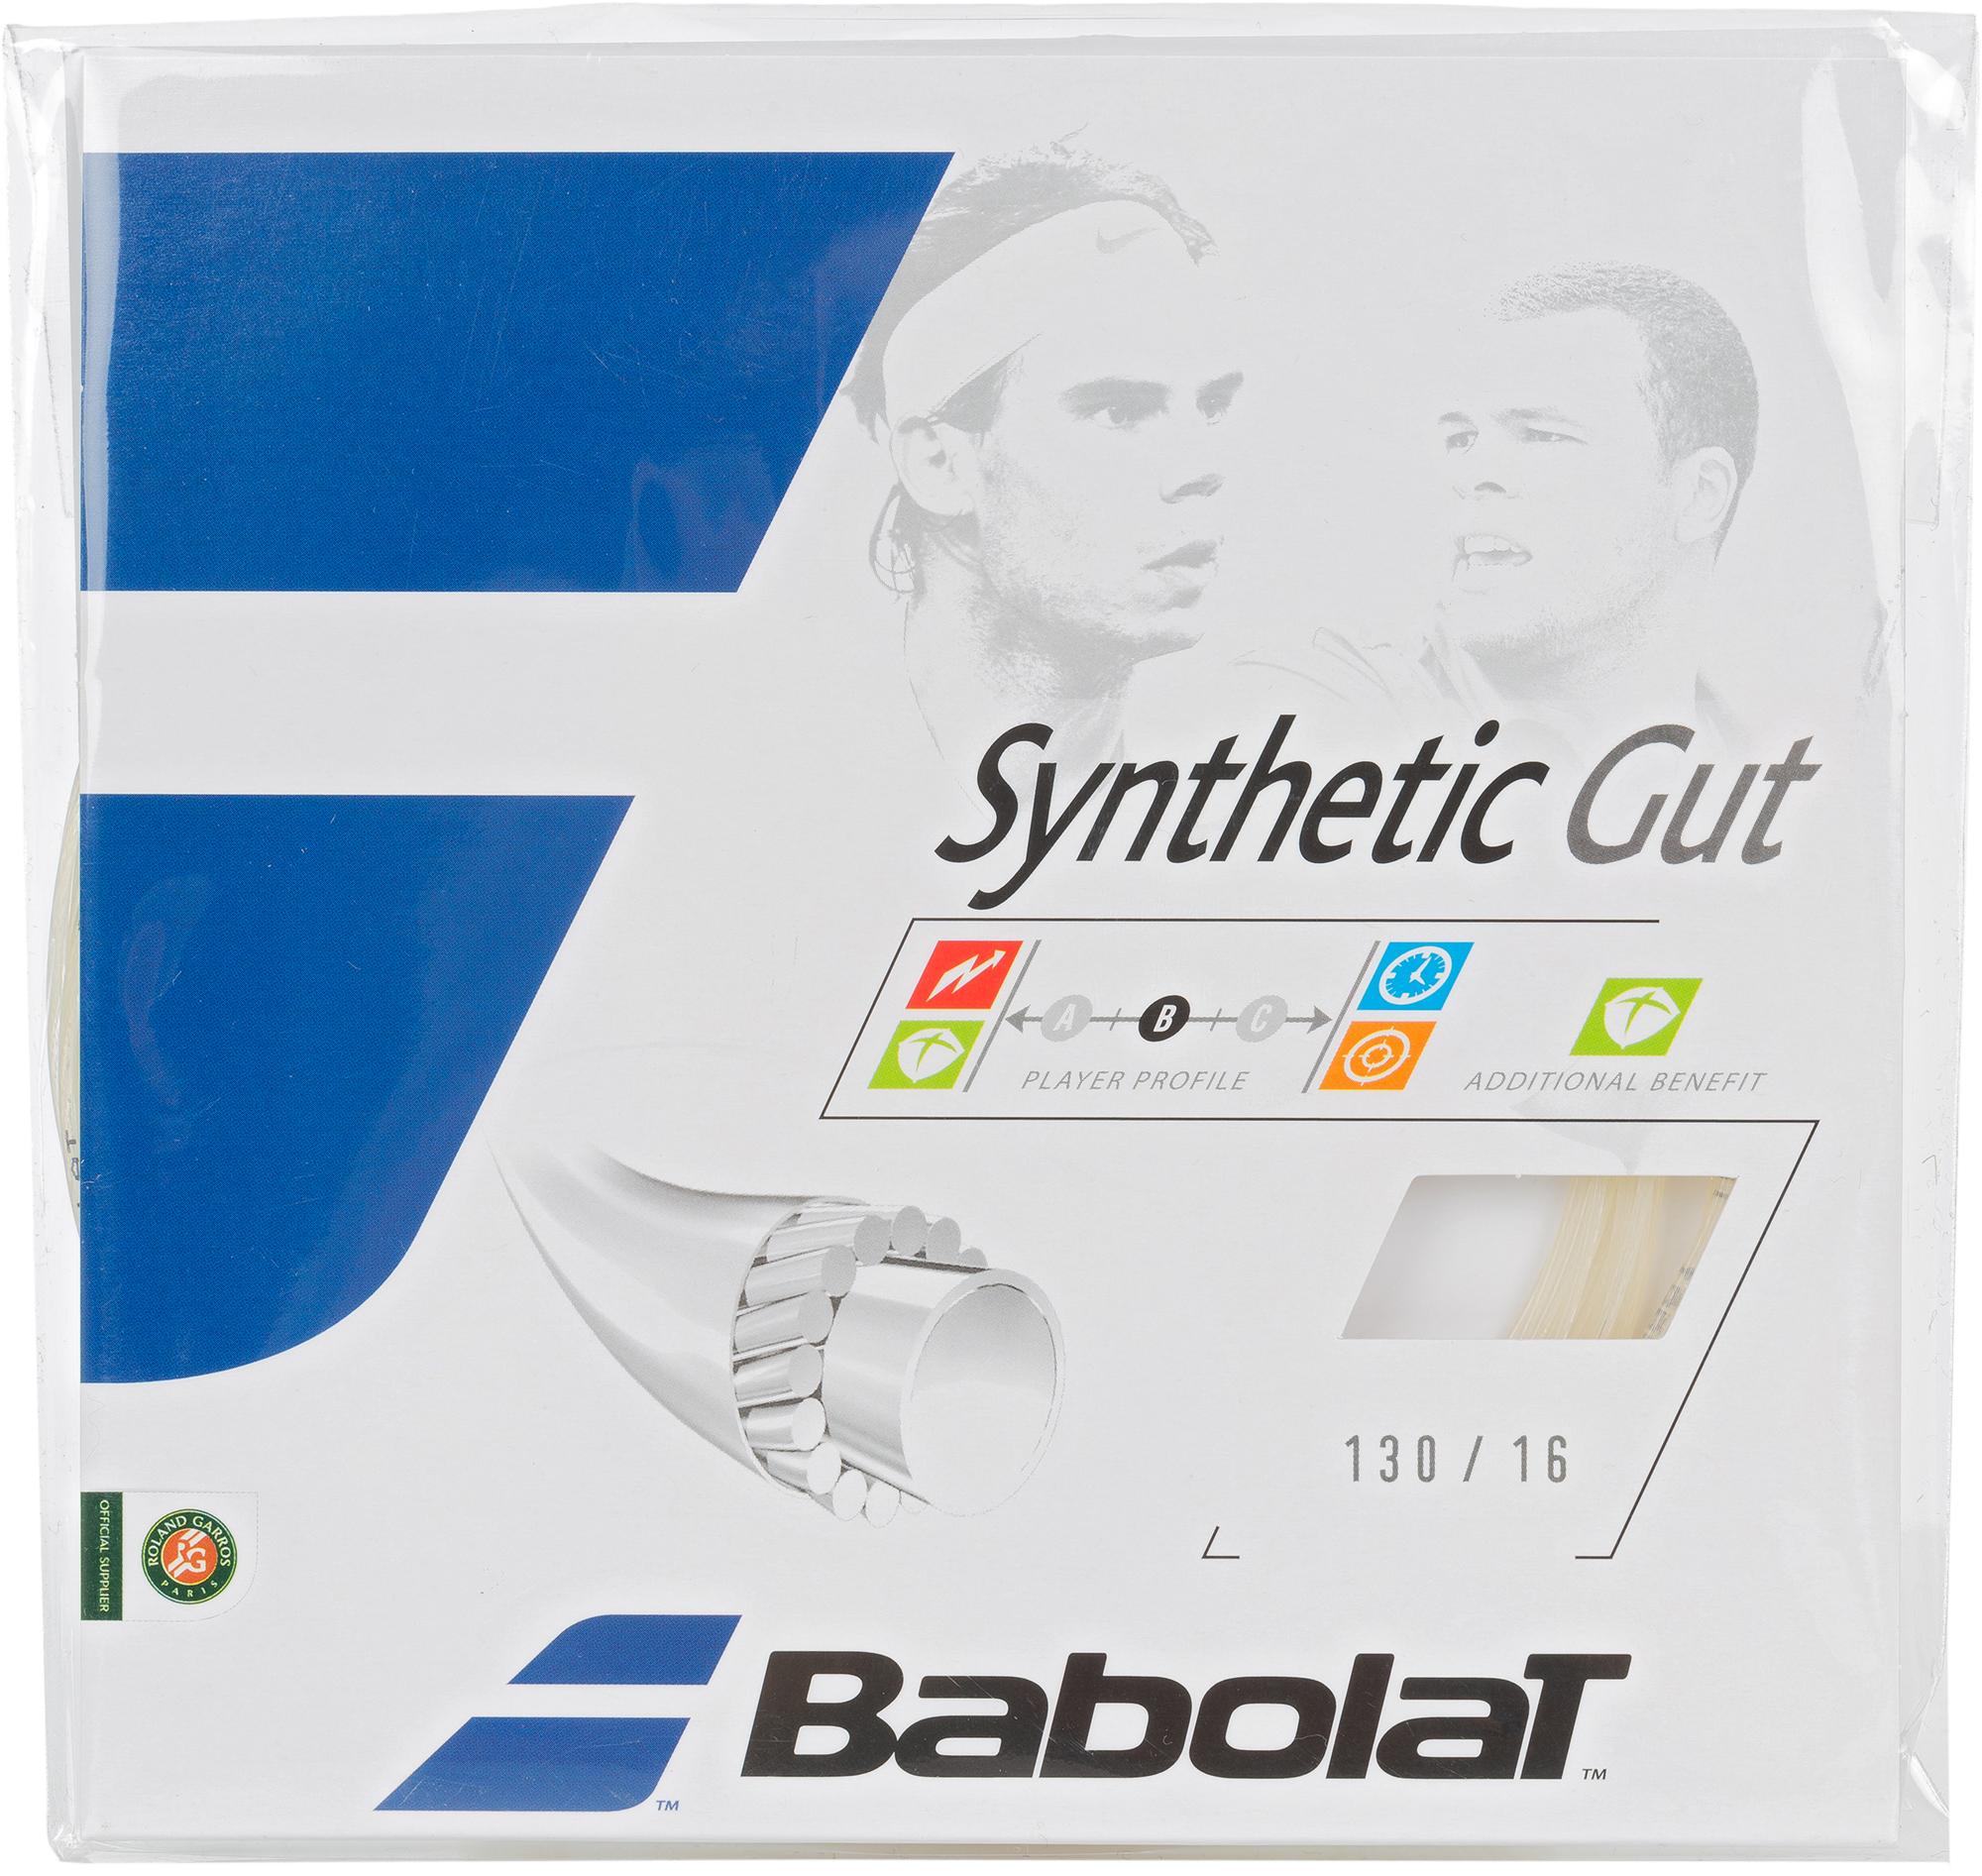 Babolat Струна Babolat Synthetic Gut 12M, 130/16 теннисный инвентарь babolat tonic string